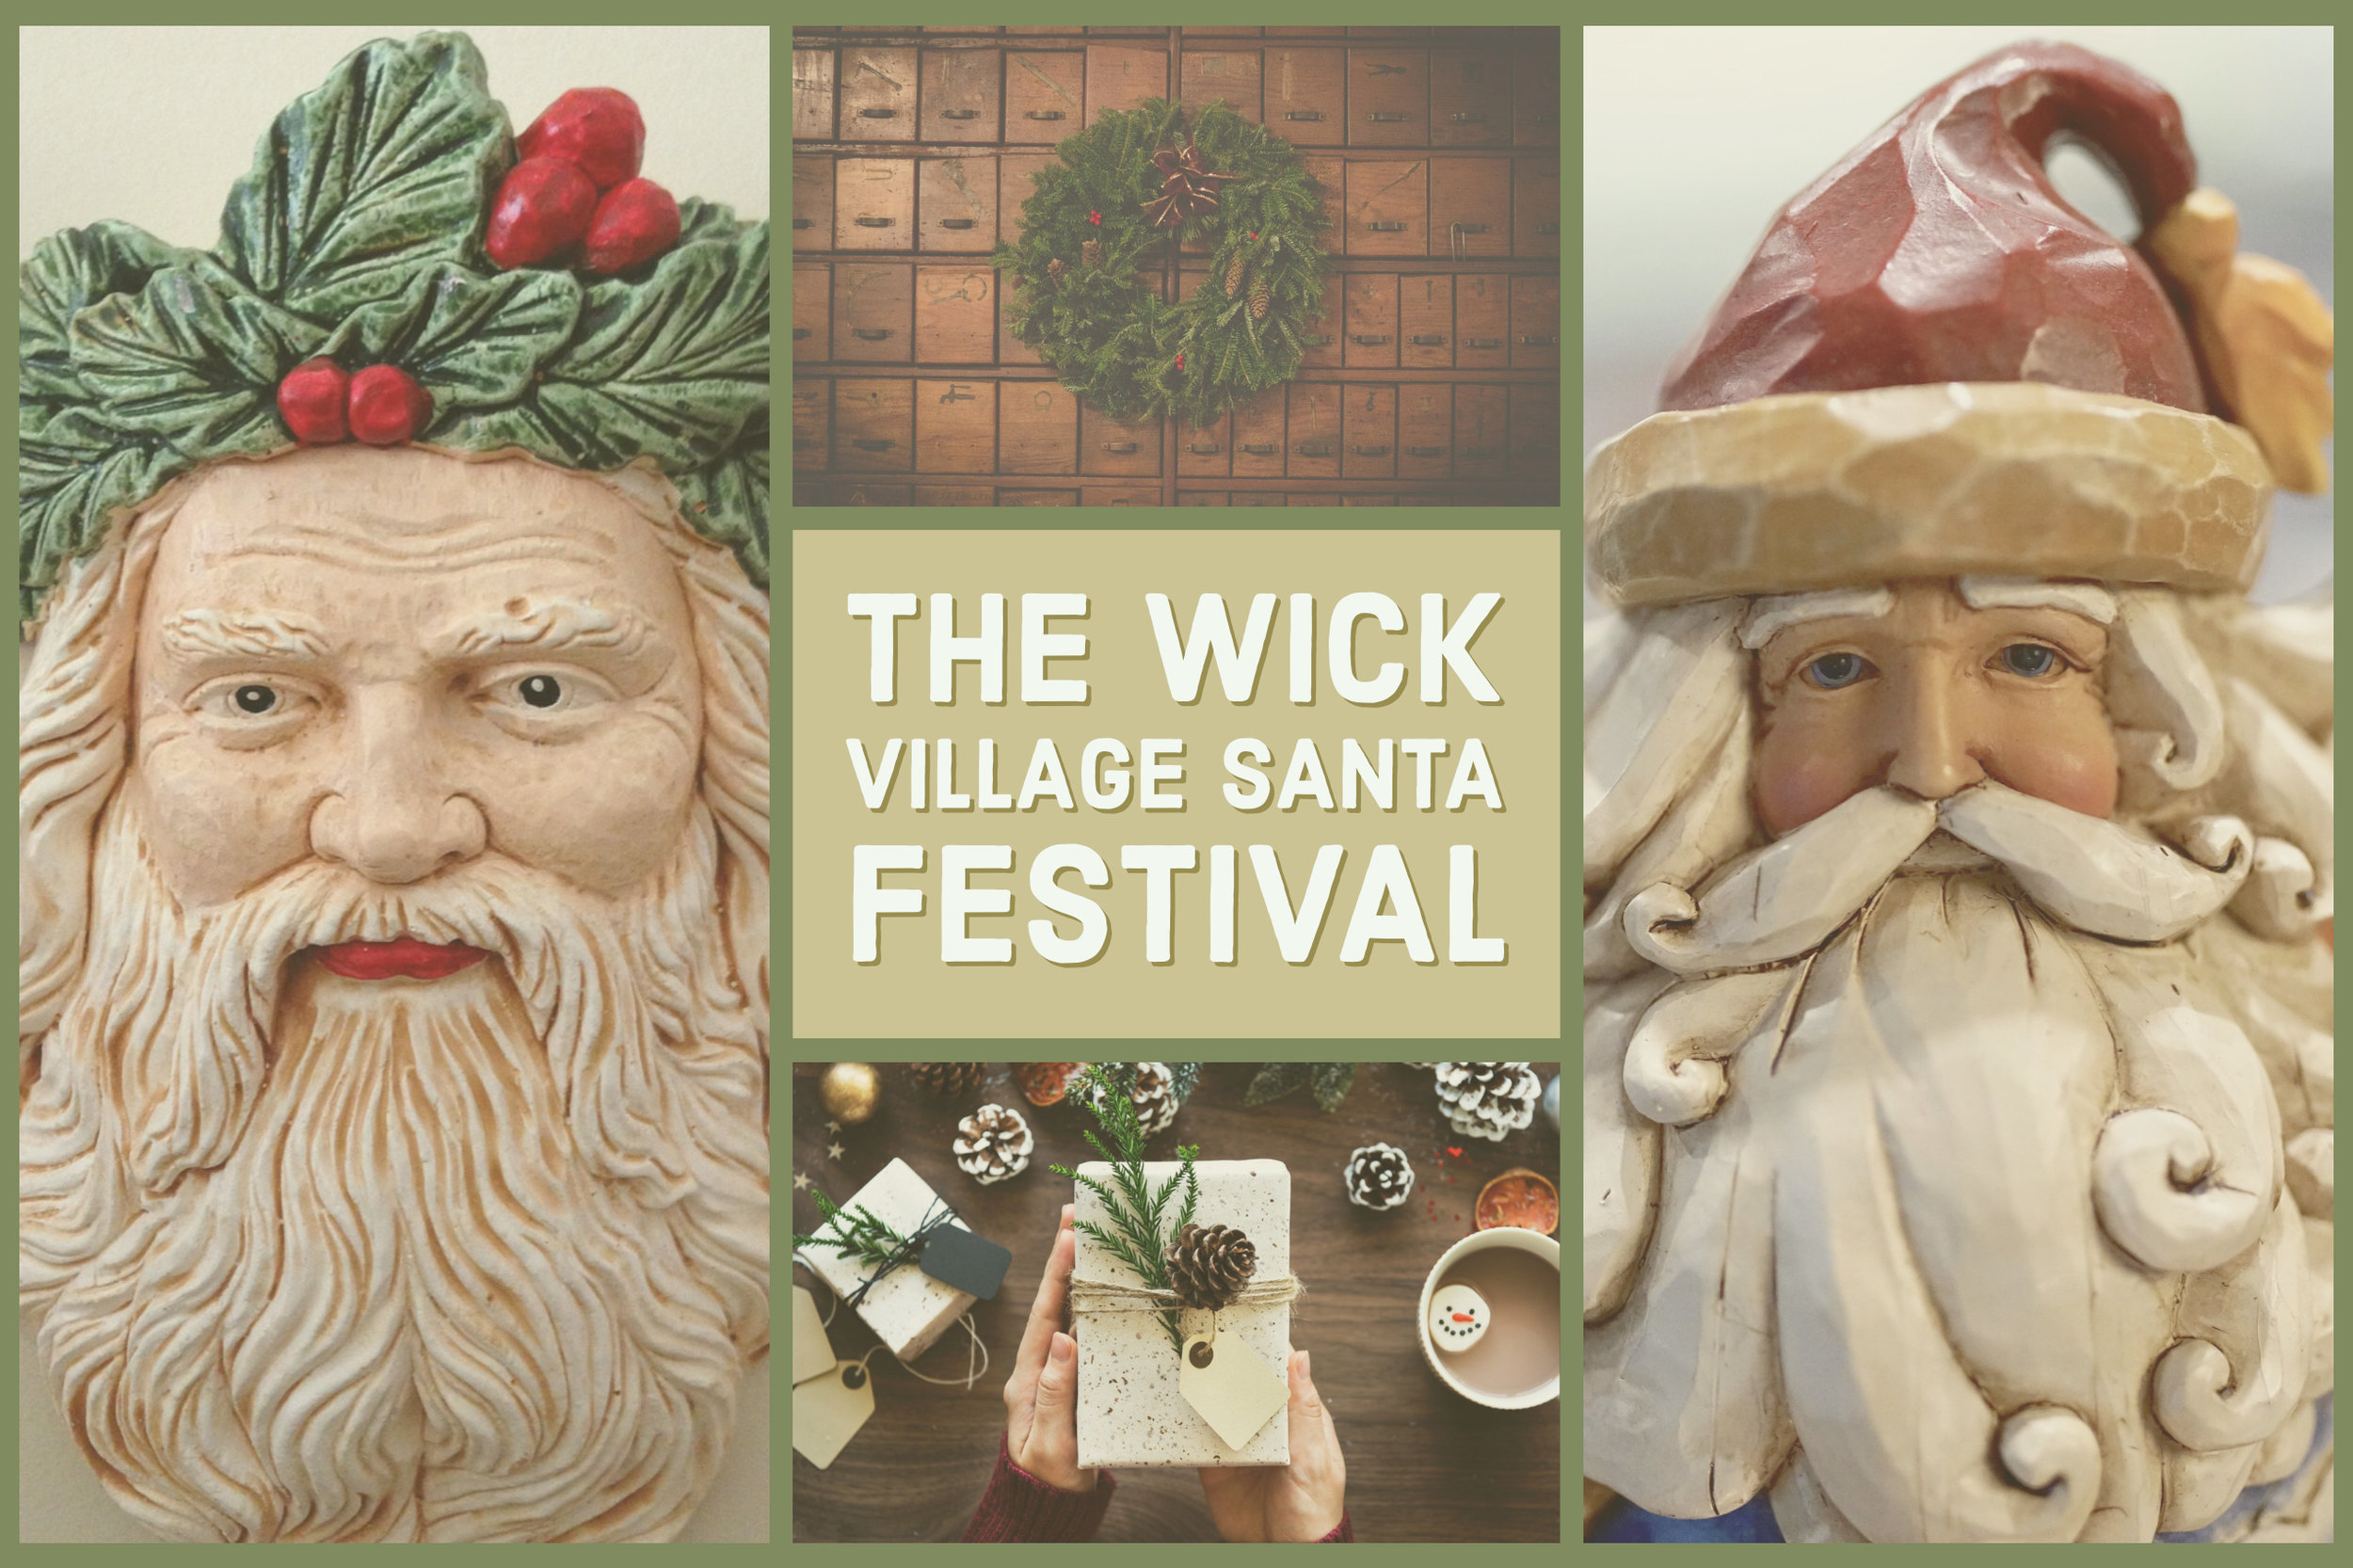 The Wick Village Santa Festival - Christmas 2018